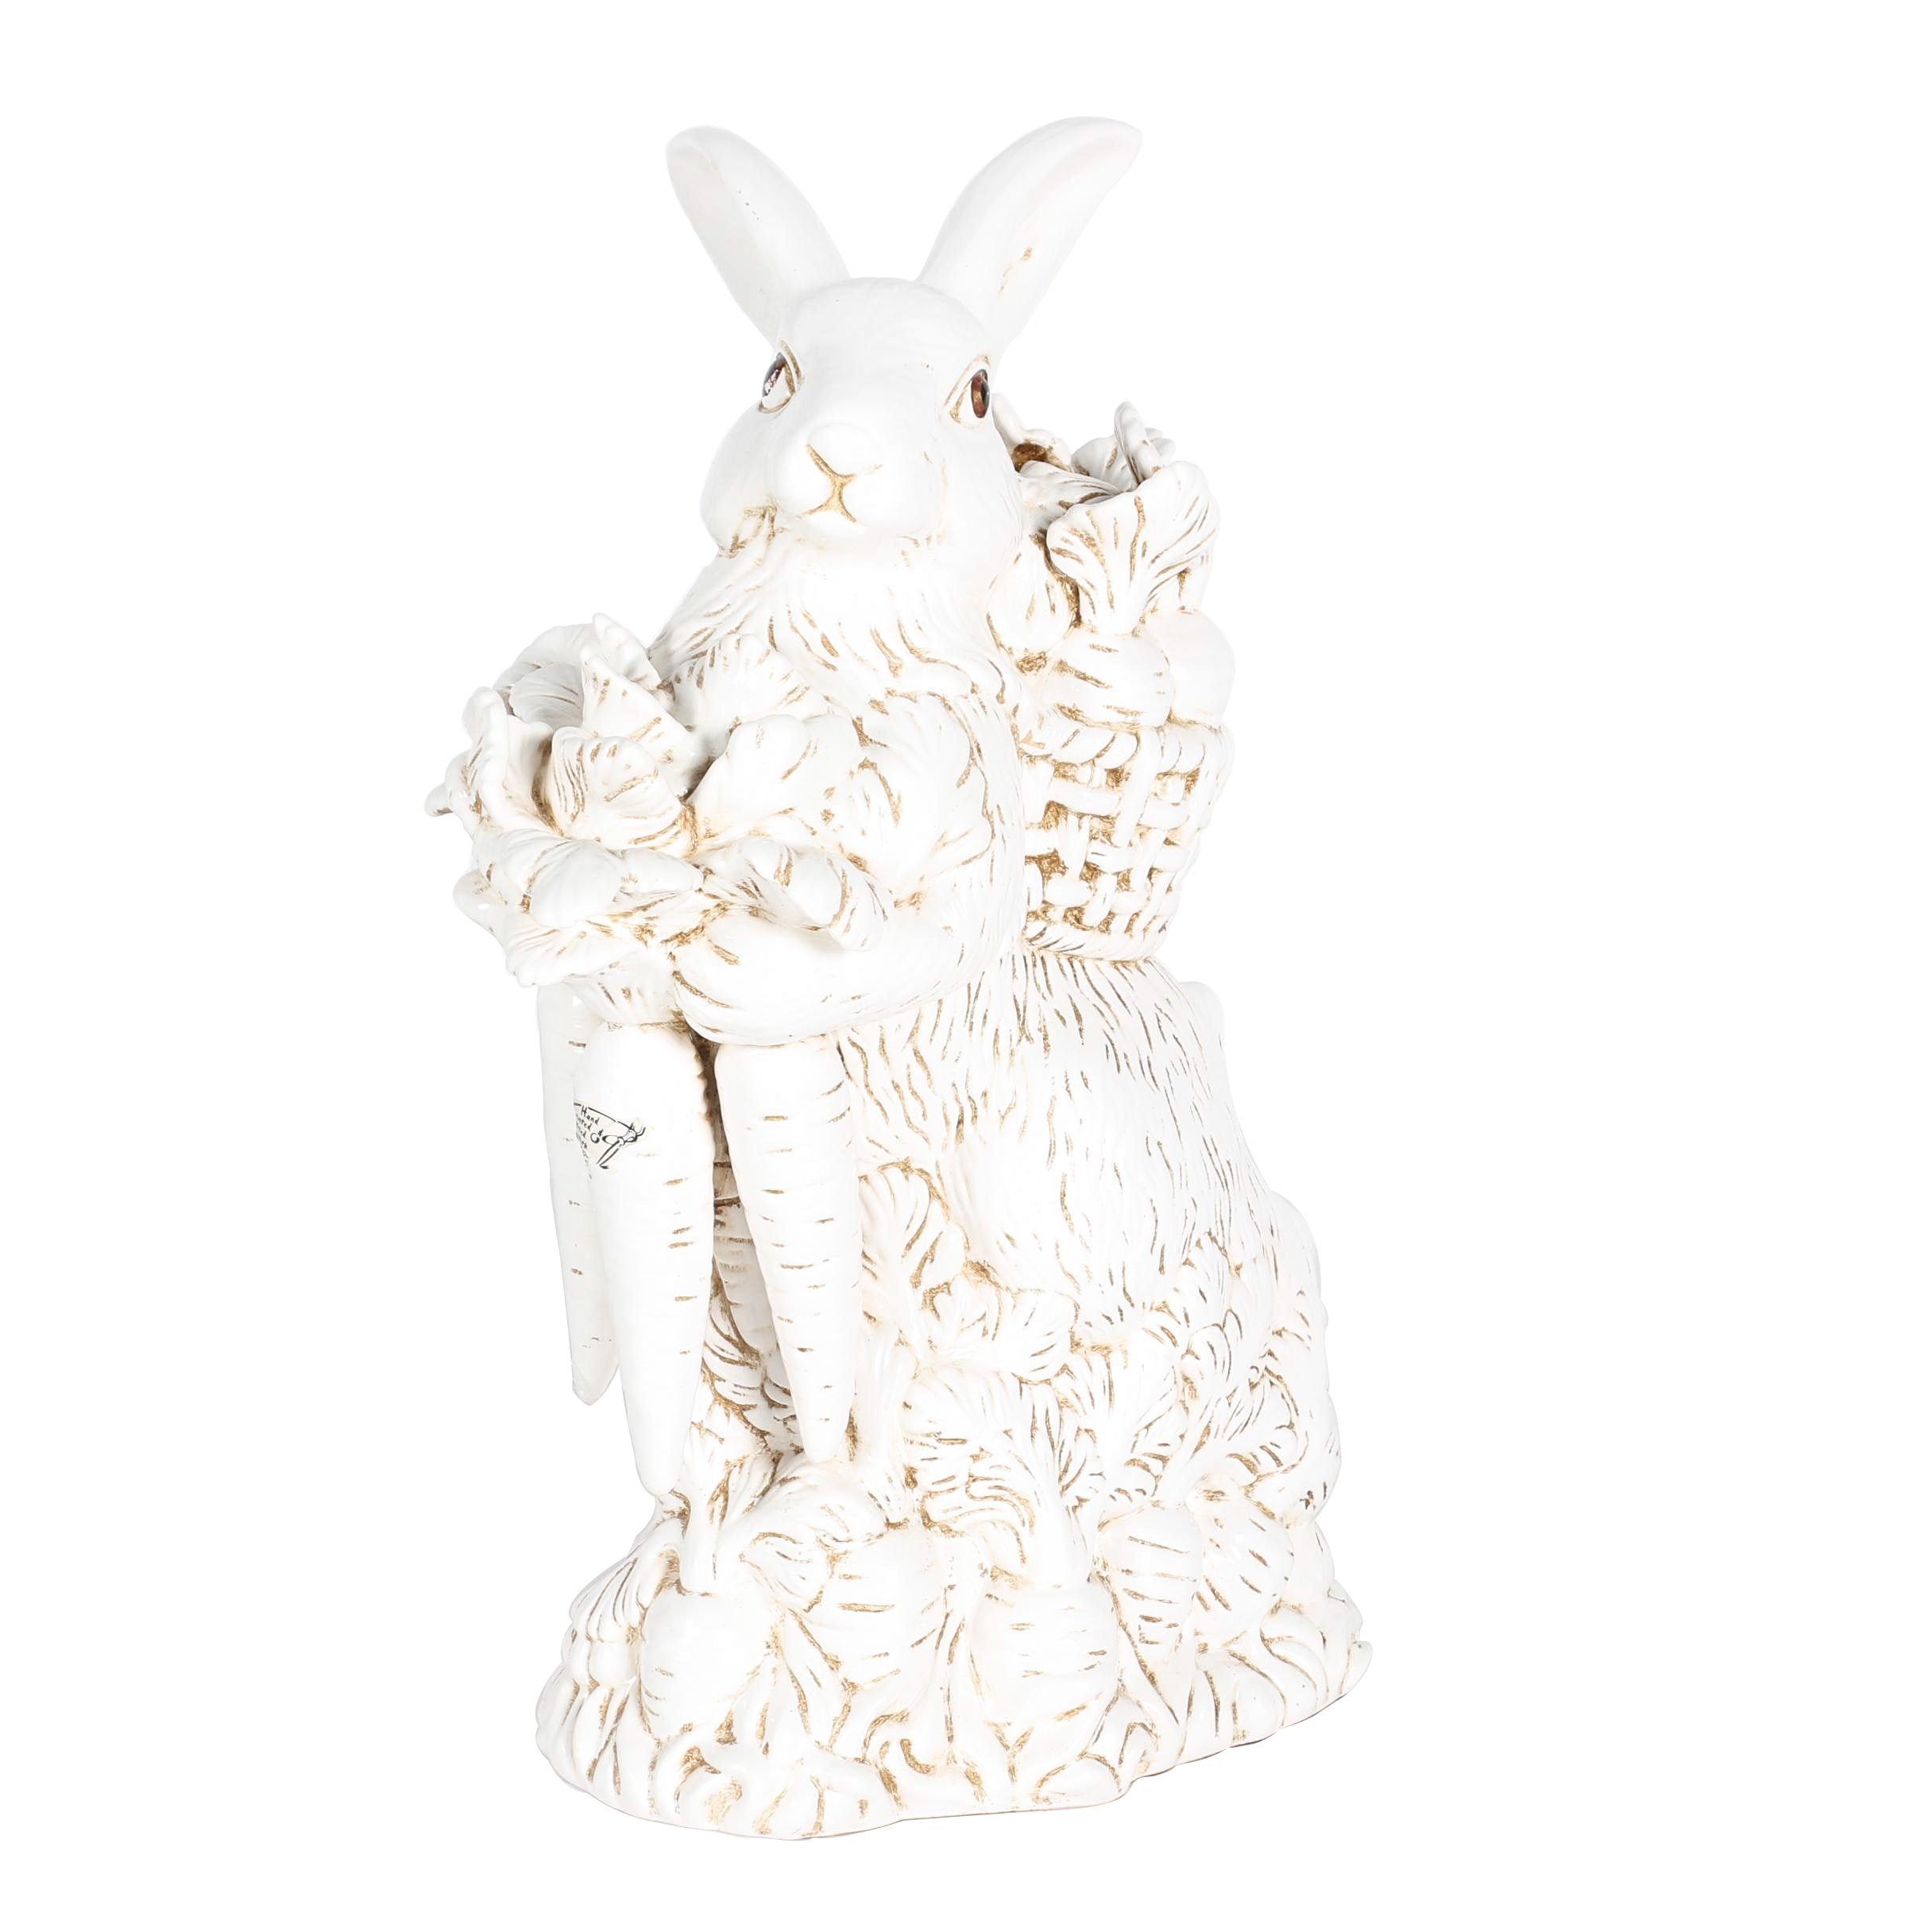 Hand-Pained Garden Rabbit Figurine